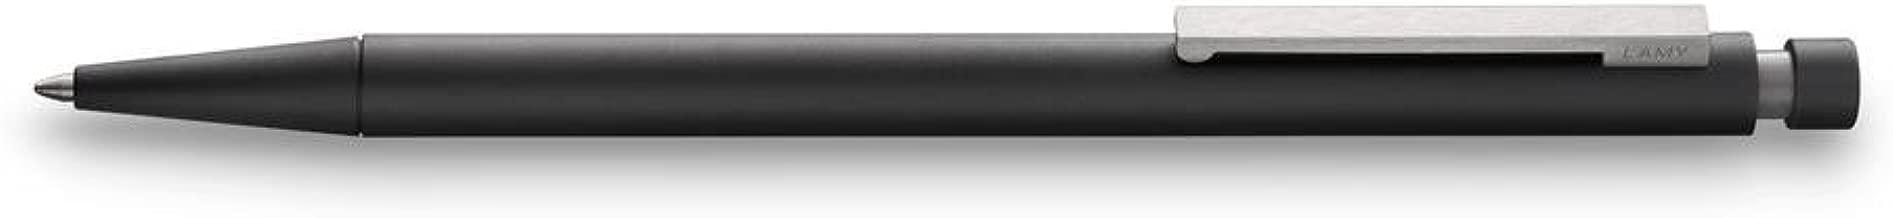 LAMY CP1 Black Ballpoint Pen (L256)